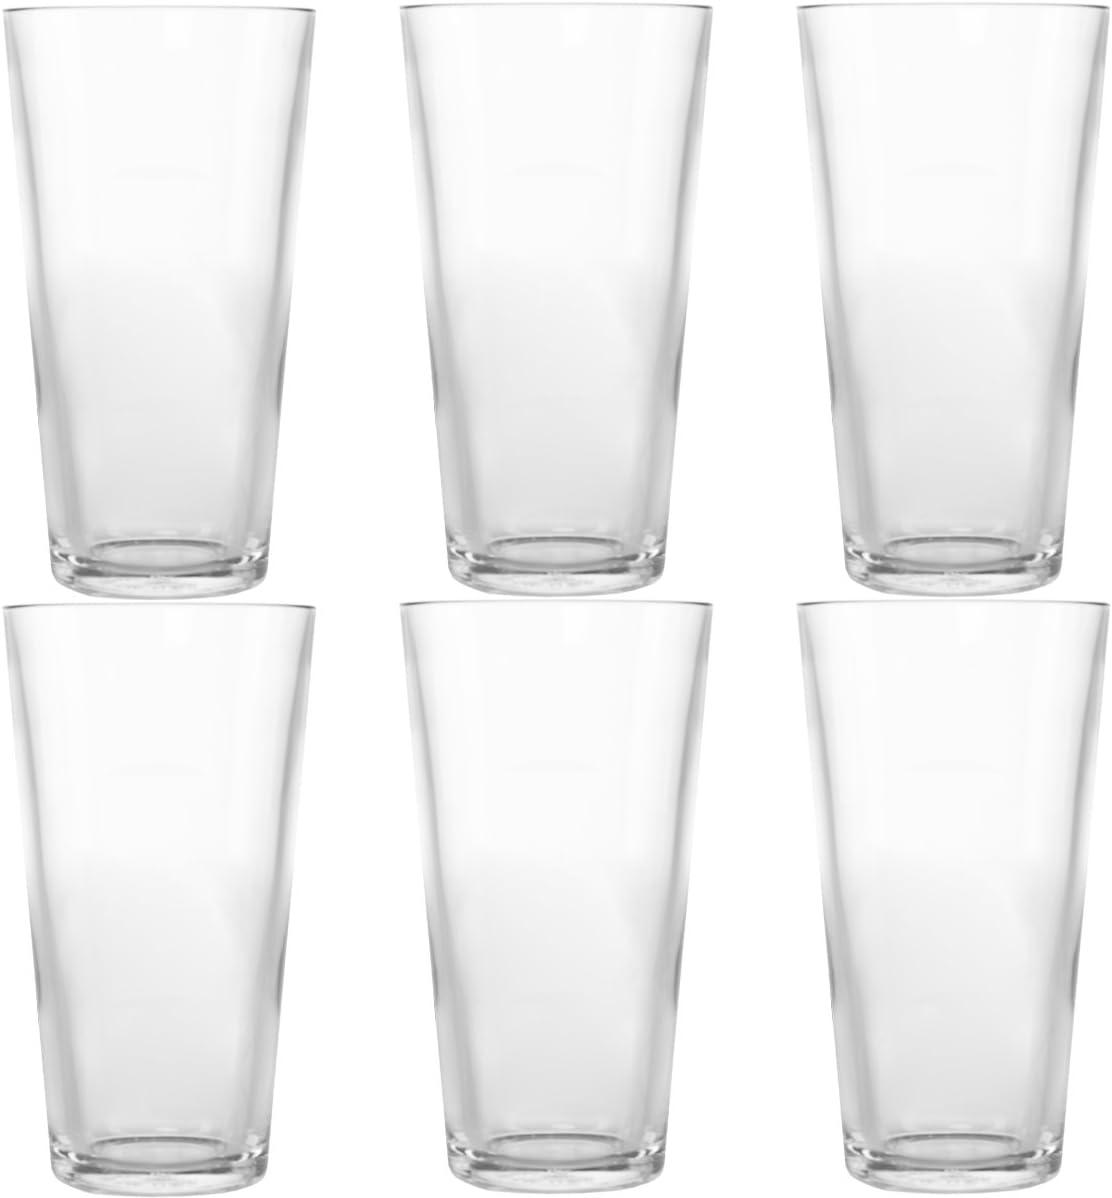 Symglass 6 Pack 16oz Plastic Pint Beer Glasses Thick Unbreakable Tritan Pubware Bar Amazon Co Uk Kitchen Home